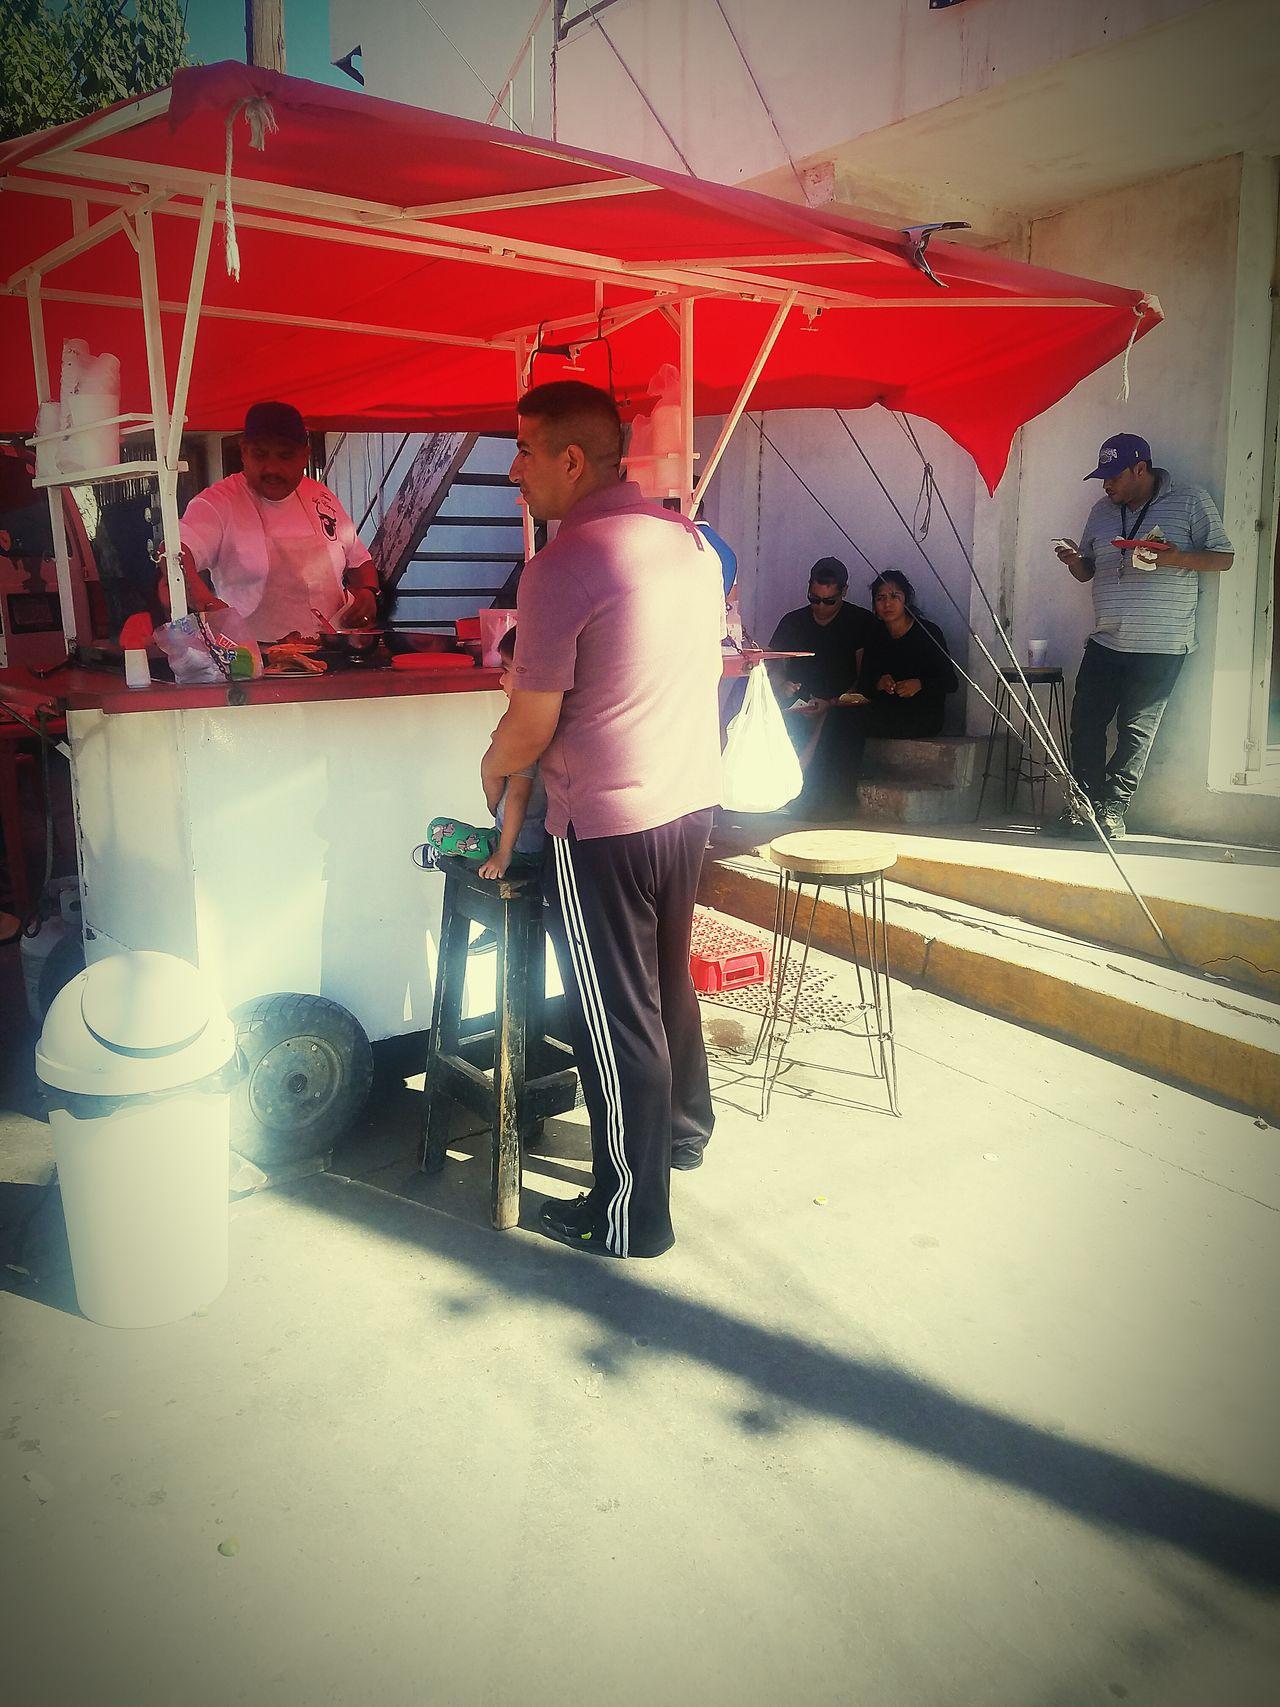 Tacos De Birria ✌❤ Full LengthLos mejores tacos de birria que he probado Fast Food Junk Food Streetphotography Streetphoto Birria Mexico Tijuana, Mexico Lagloria People First Eyeem Photo